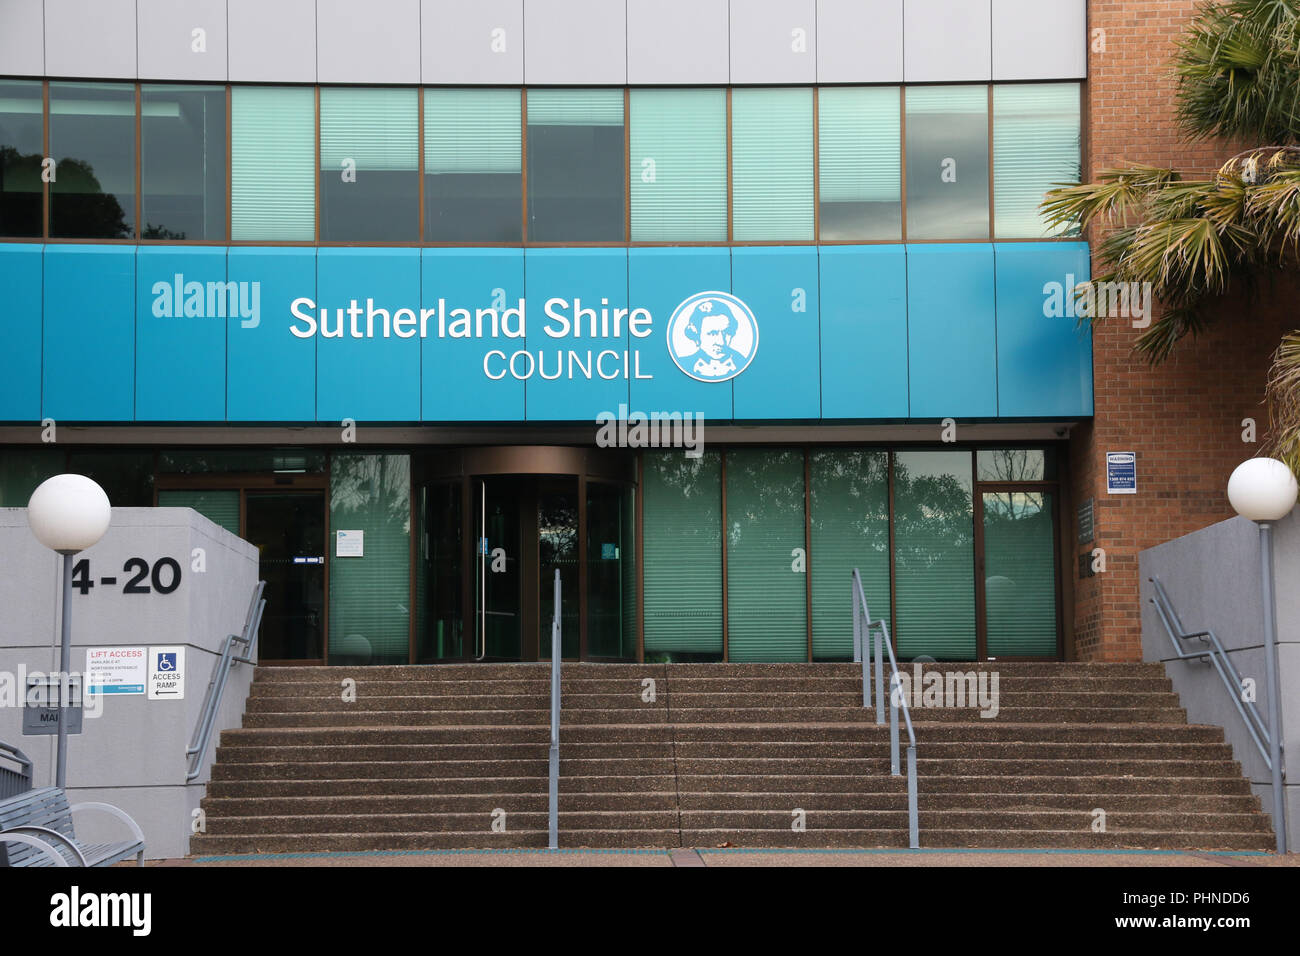 Shire Council Stock Photos & Shire Council Stock Images - Alamy